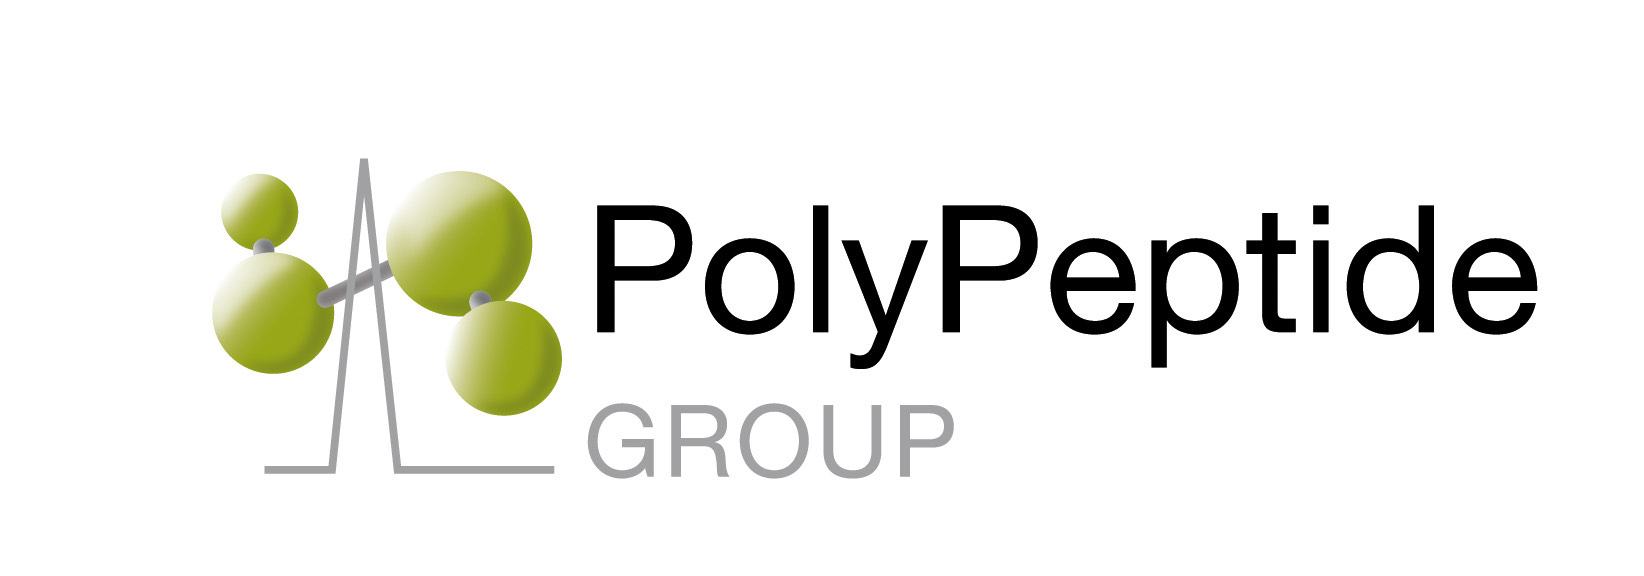 Polypeptide